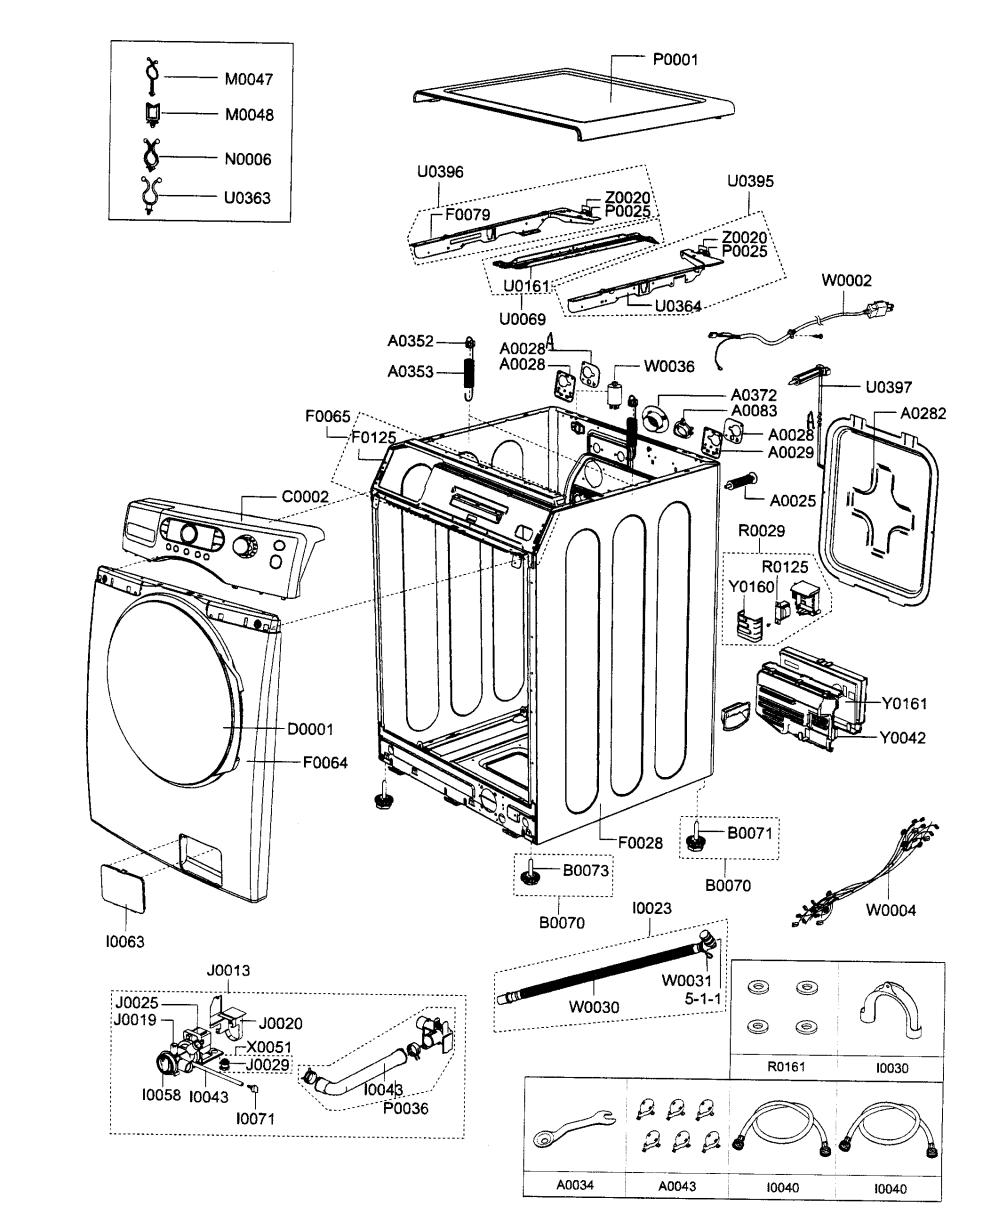 medium resolution of wiring diagram for samsung washer wiring diagram origin cabrio washer wiring diagram for samsung washing machine